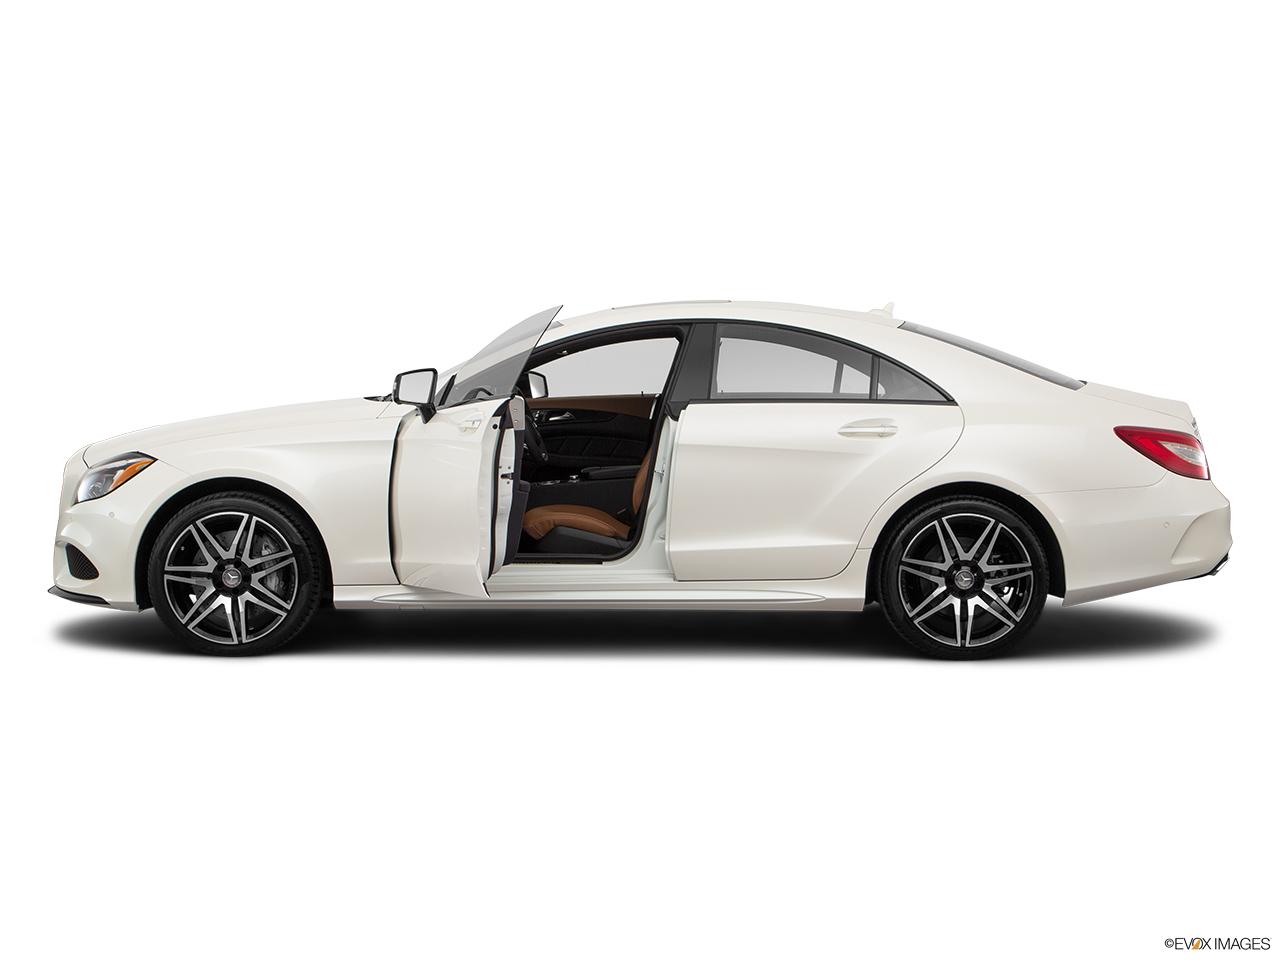 mercedes benz cls class 2018 cls 500 in uae new car. Black Bedroom Furniture Sets. Home Design Ideas